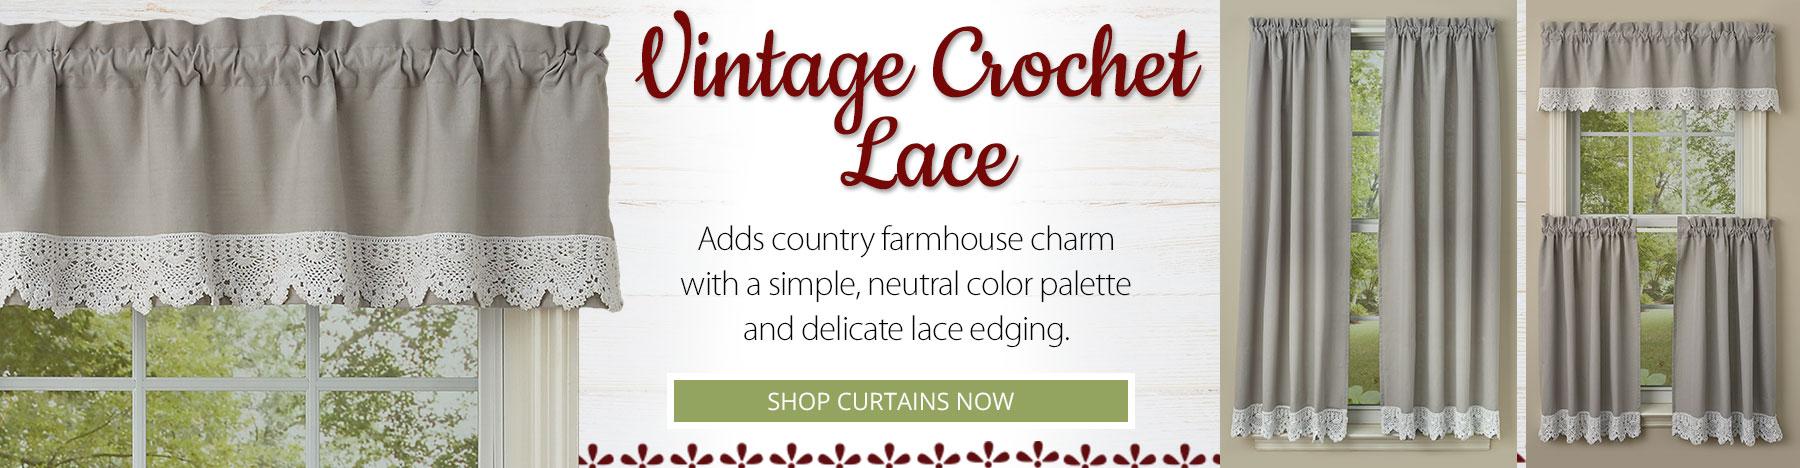 Vintage Crochet Lace Valances, Tiers, Panels and Shower Curtains